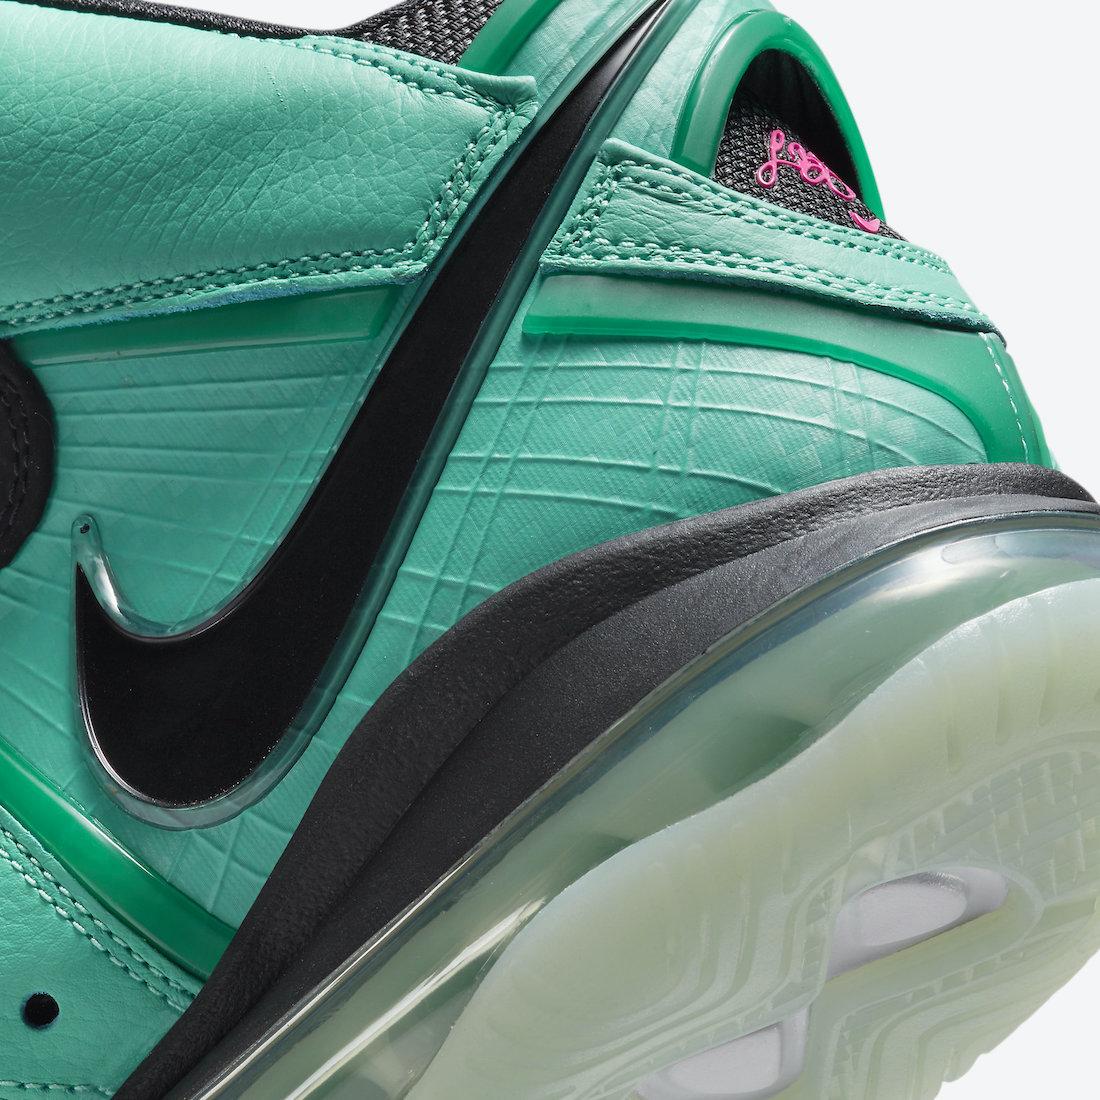 Nike-LeBron-8-South-Beach-CZ0328-400-Release-Date-Price-7